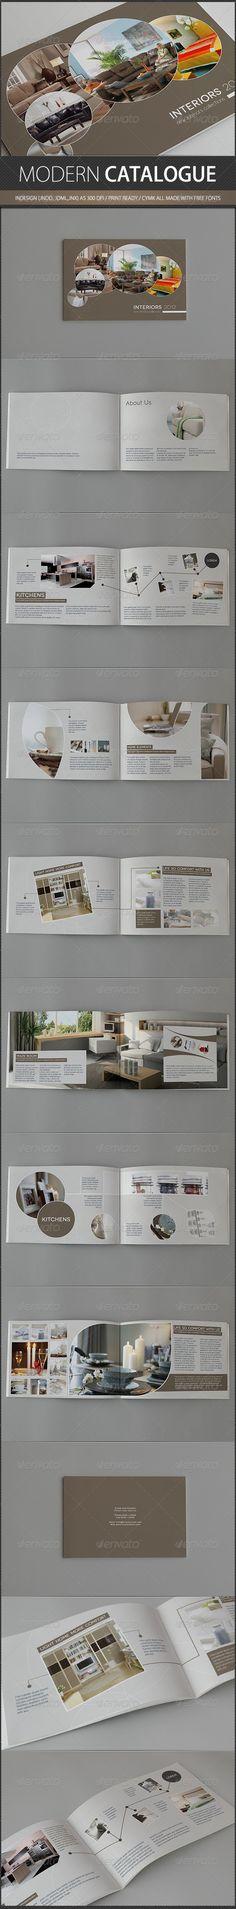 Modern Catalogue by ~UnicoDesign on deviantART